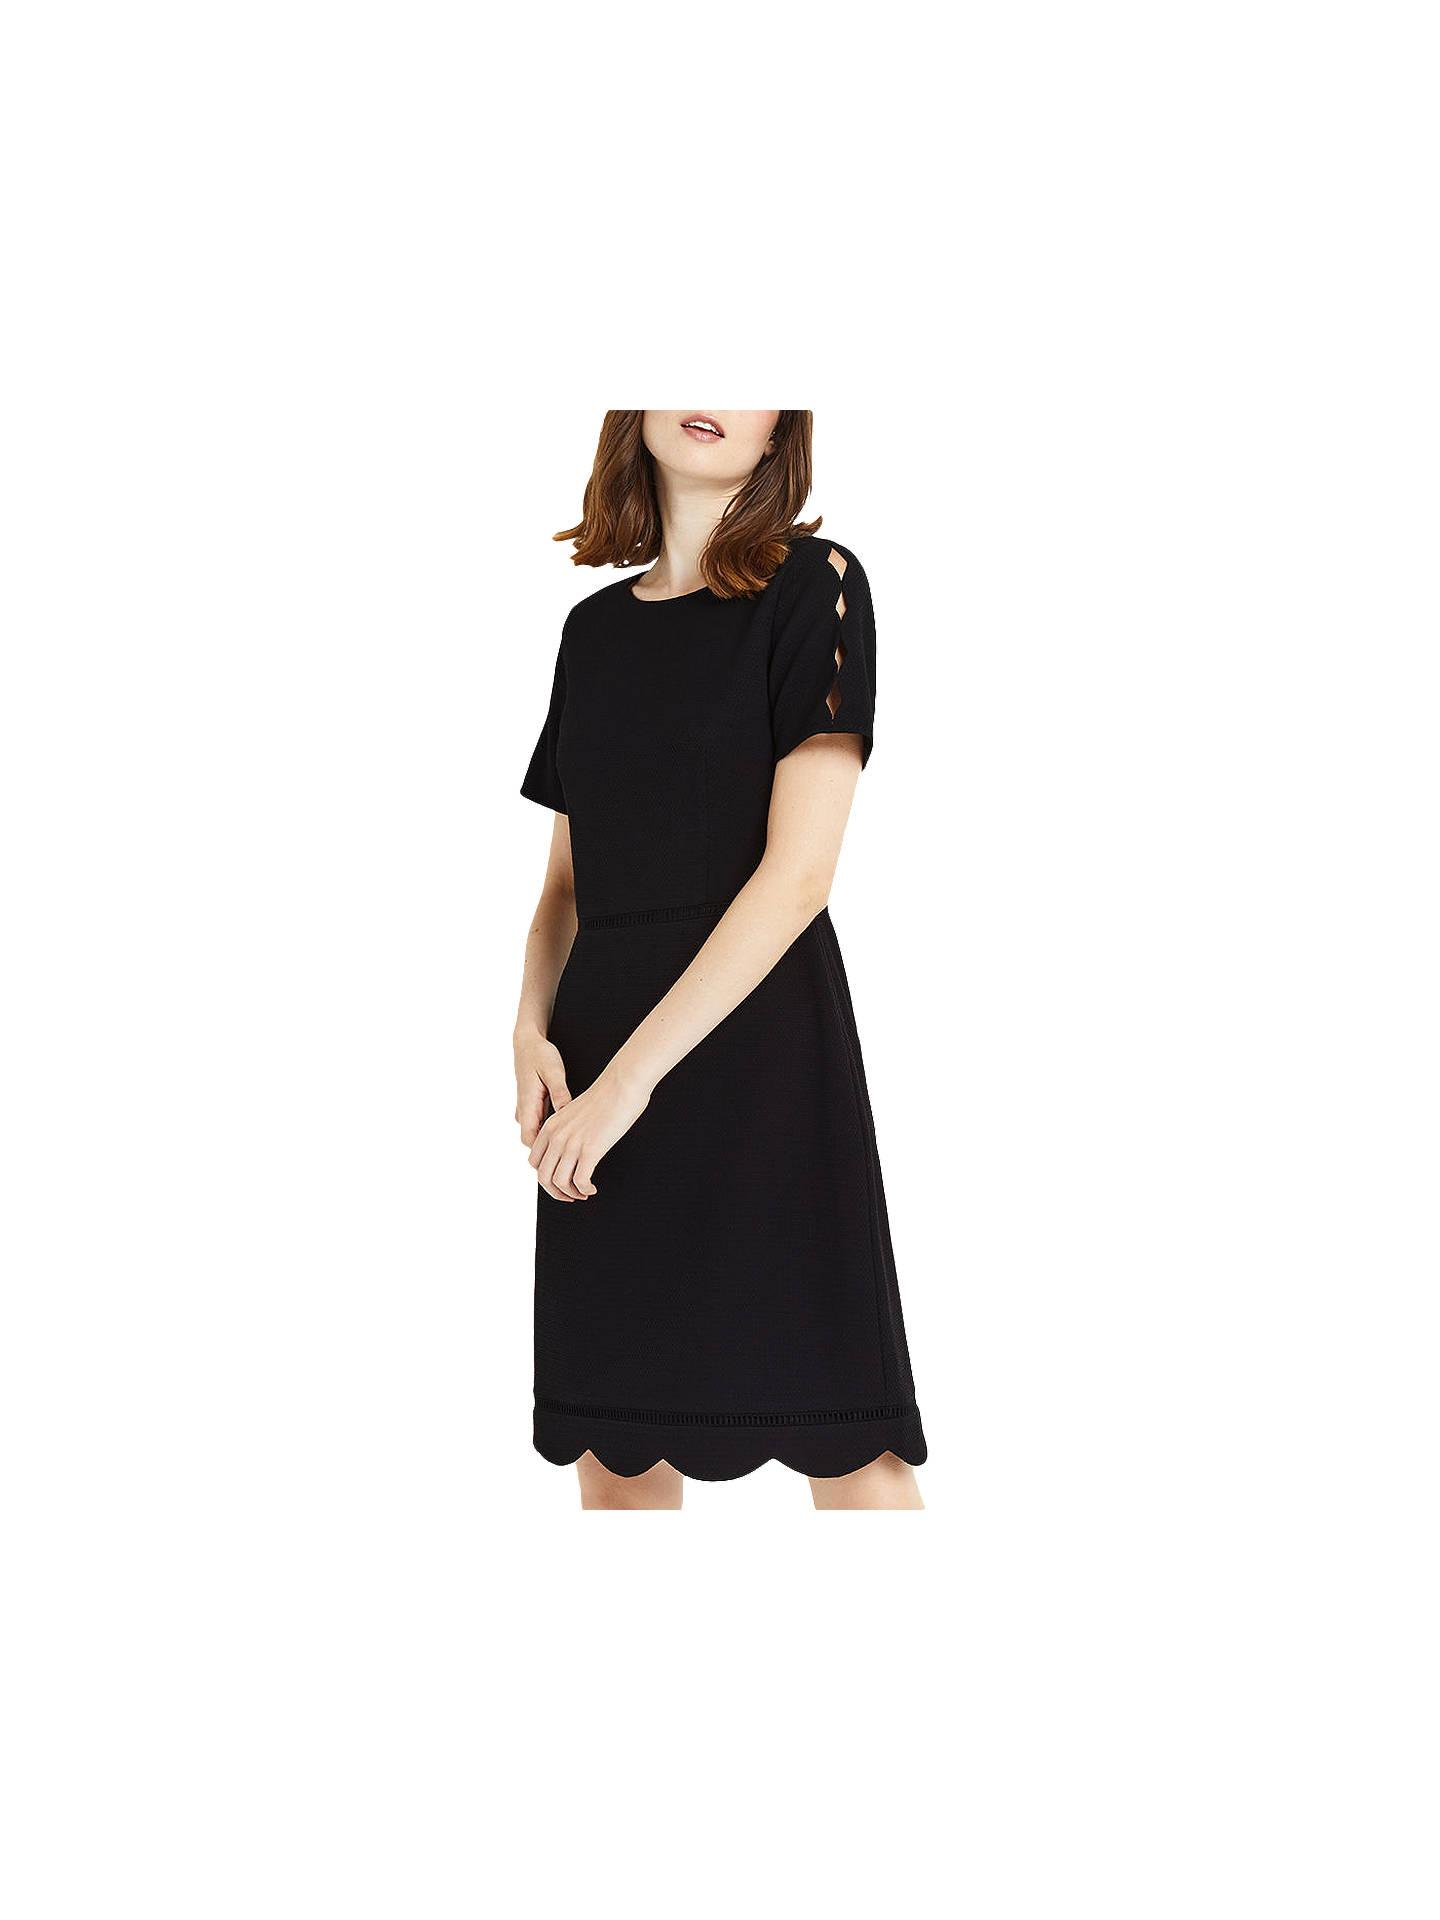 32a11e8b219d Buy Oasis Regular Length Scallop Sleeve Dress, Black, 6 Online at  johnlewis.com ...